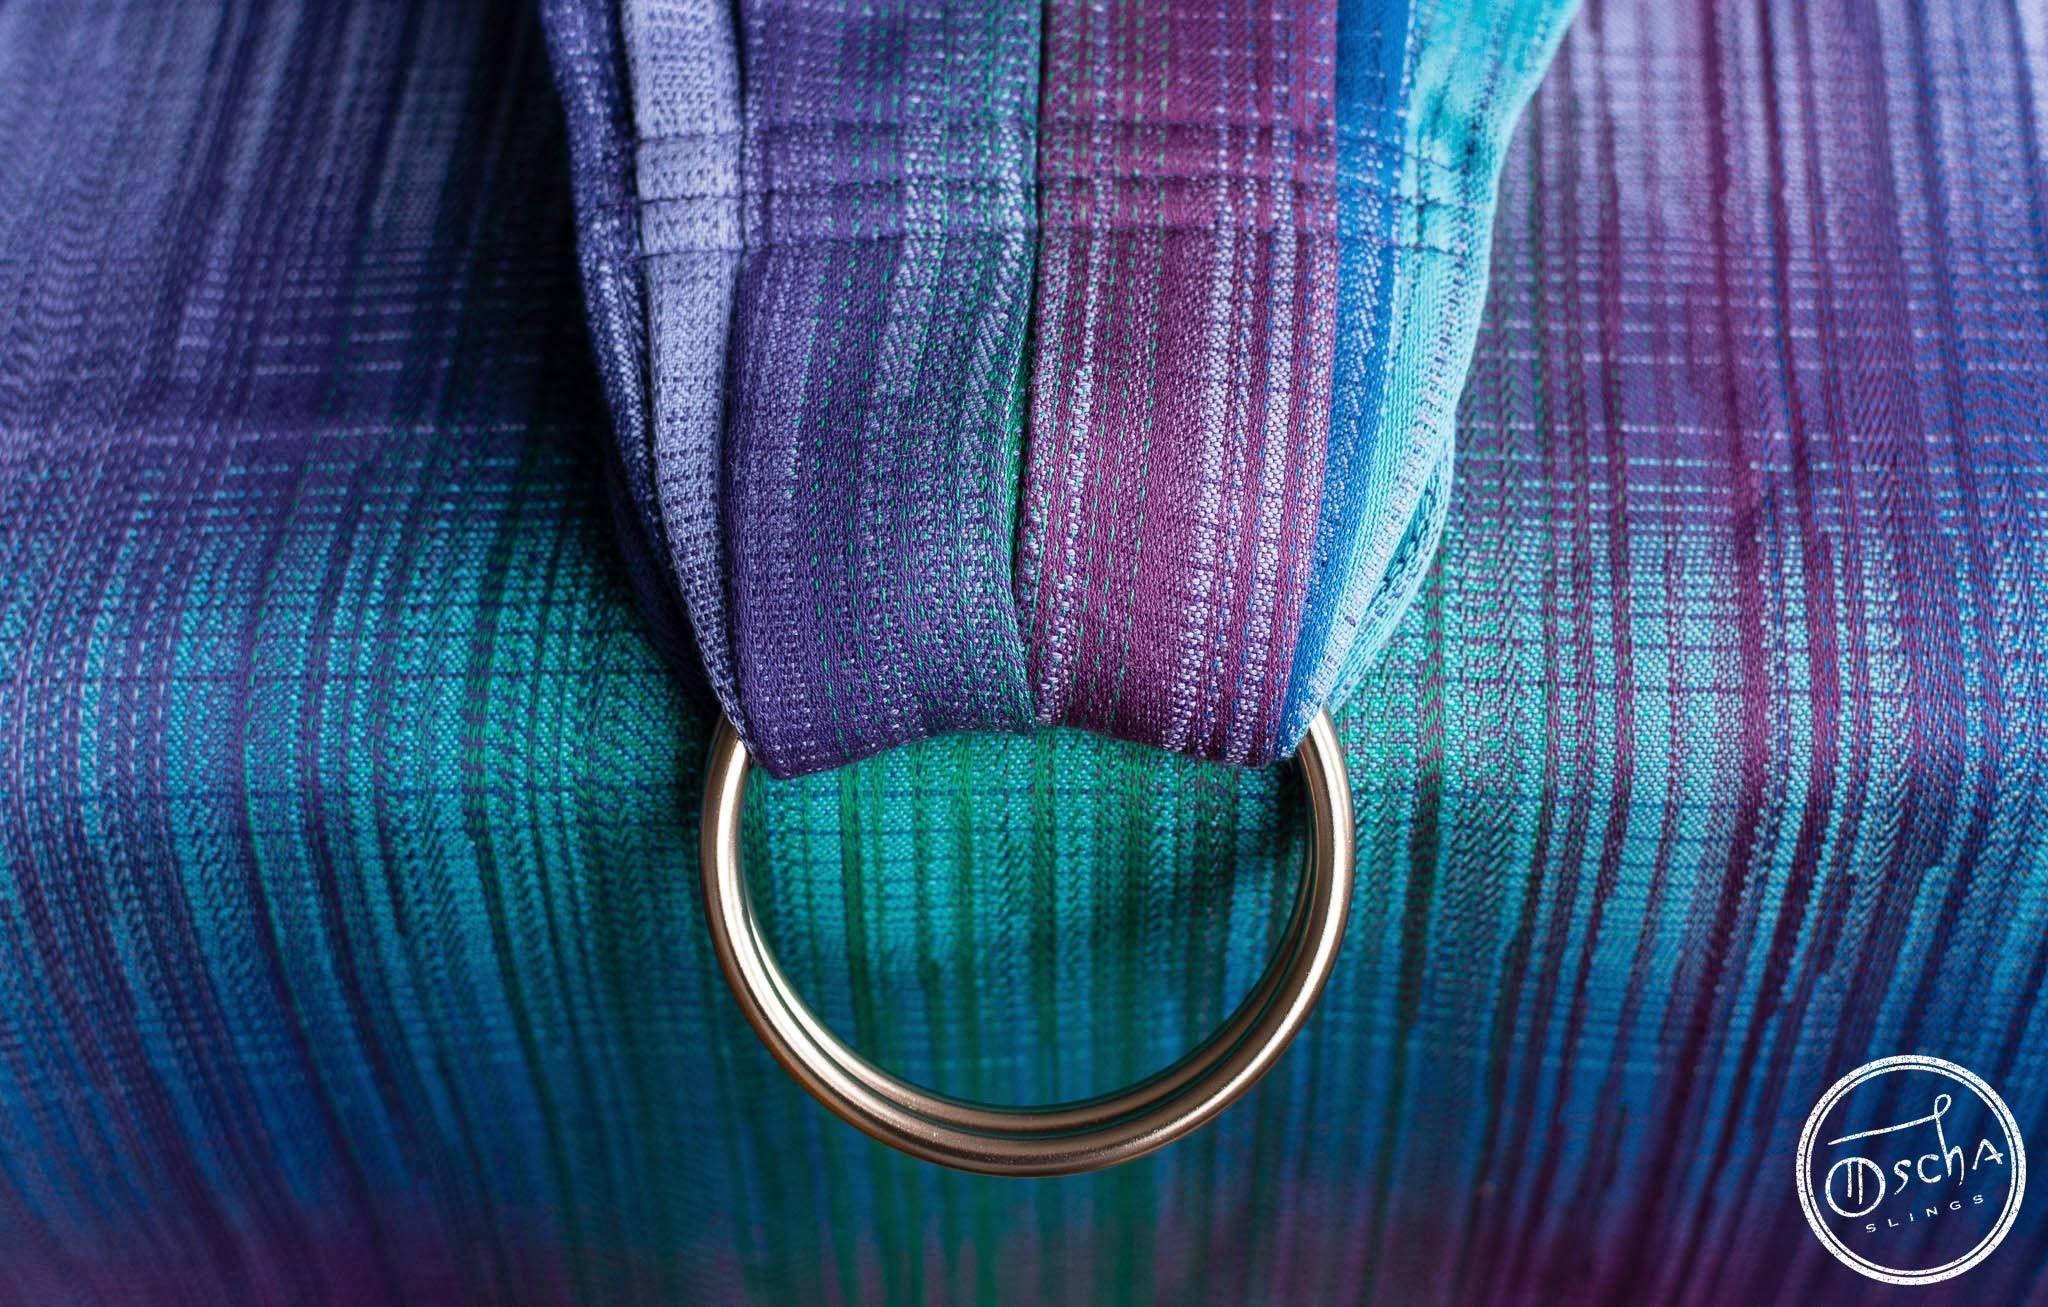 Matrix Jig of Joy Ring Sling by Oscha Slings